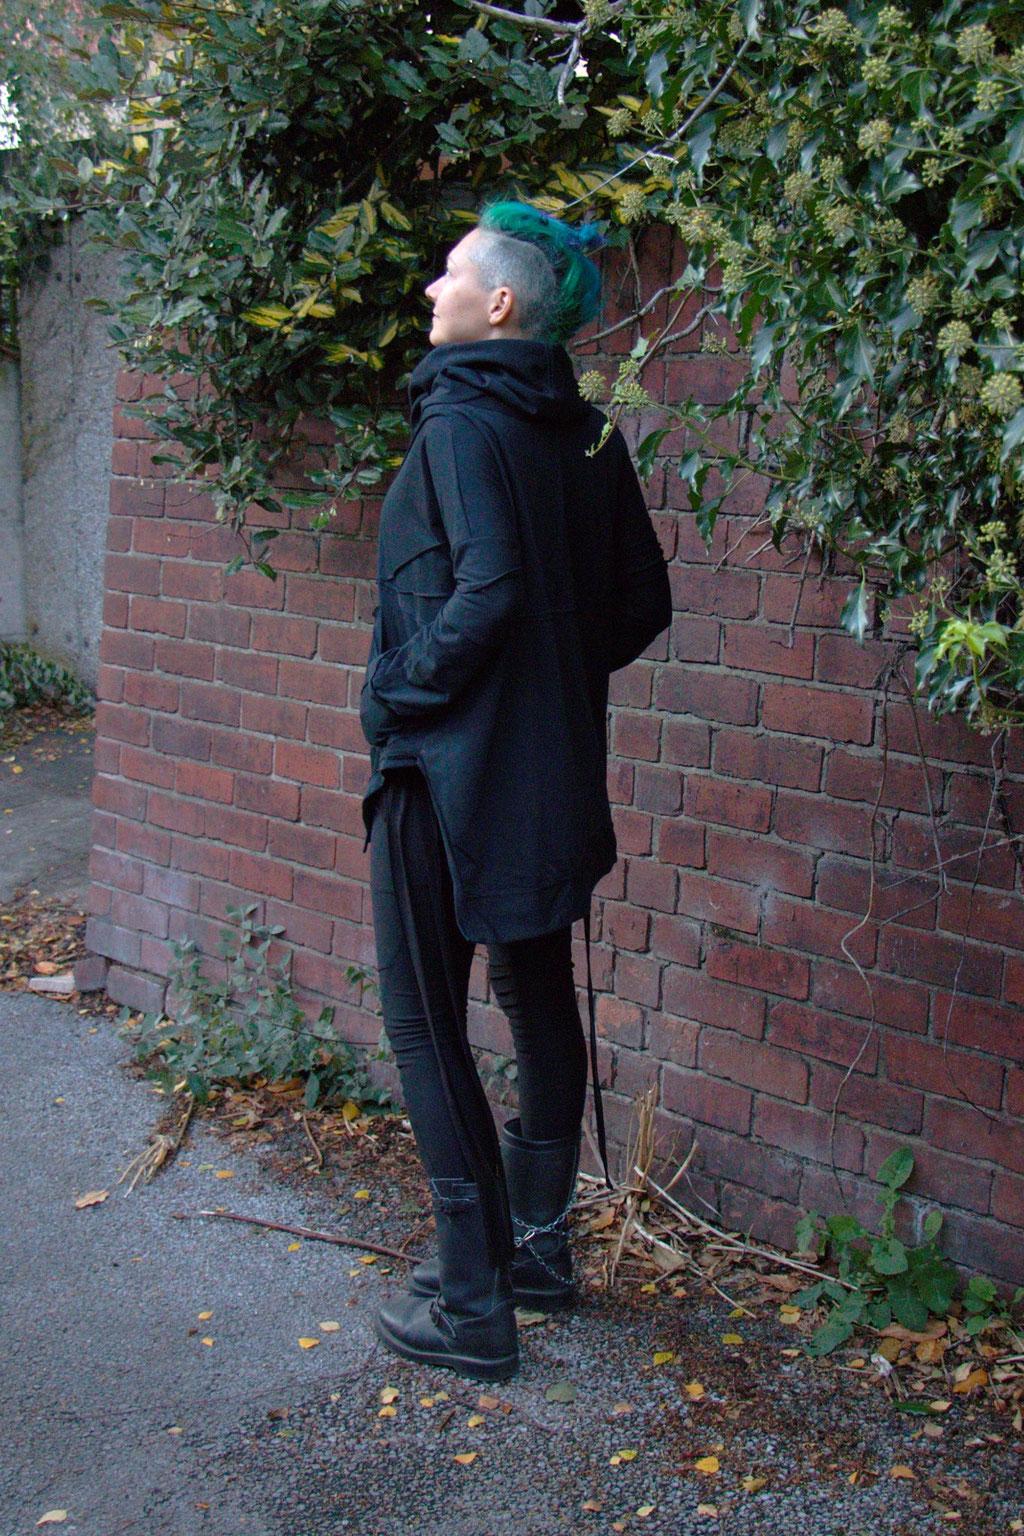 Dark post-apocalyptic outfits I wear to work - Ynhoia sweatshirt and Dorawyn leggings scout B- Zebraspider Eco Anti-Fashion